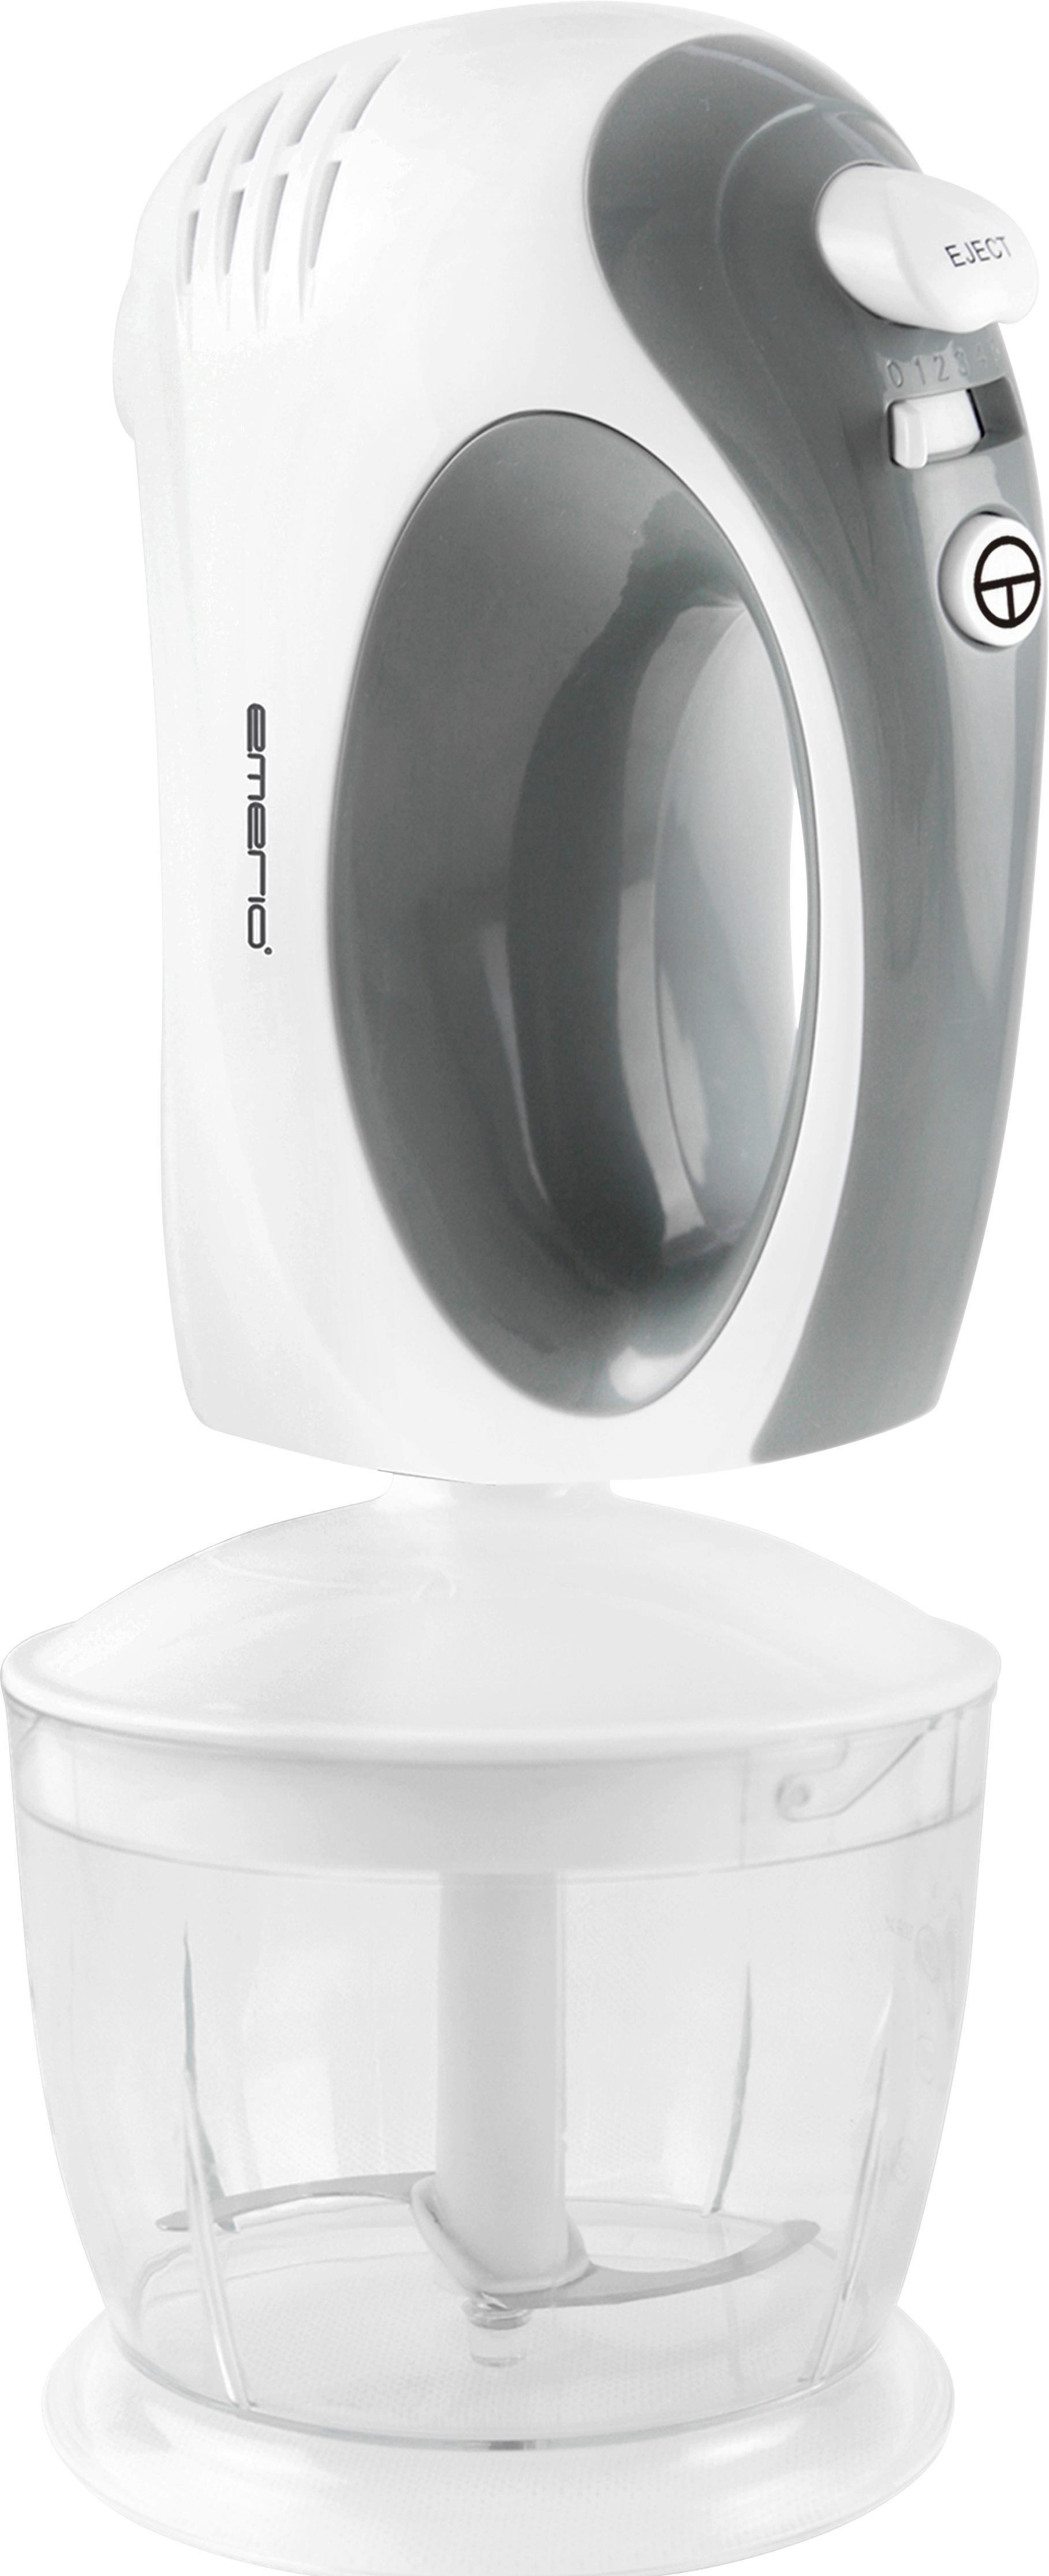 Handmixer Gerda - Weiß/Grau, Kunststoff/Metall (24/13.5/20cm) - MÖMAX modern living